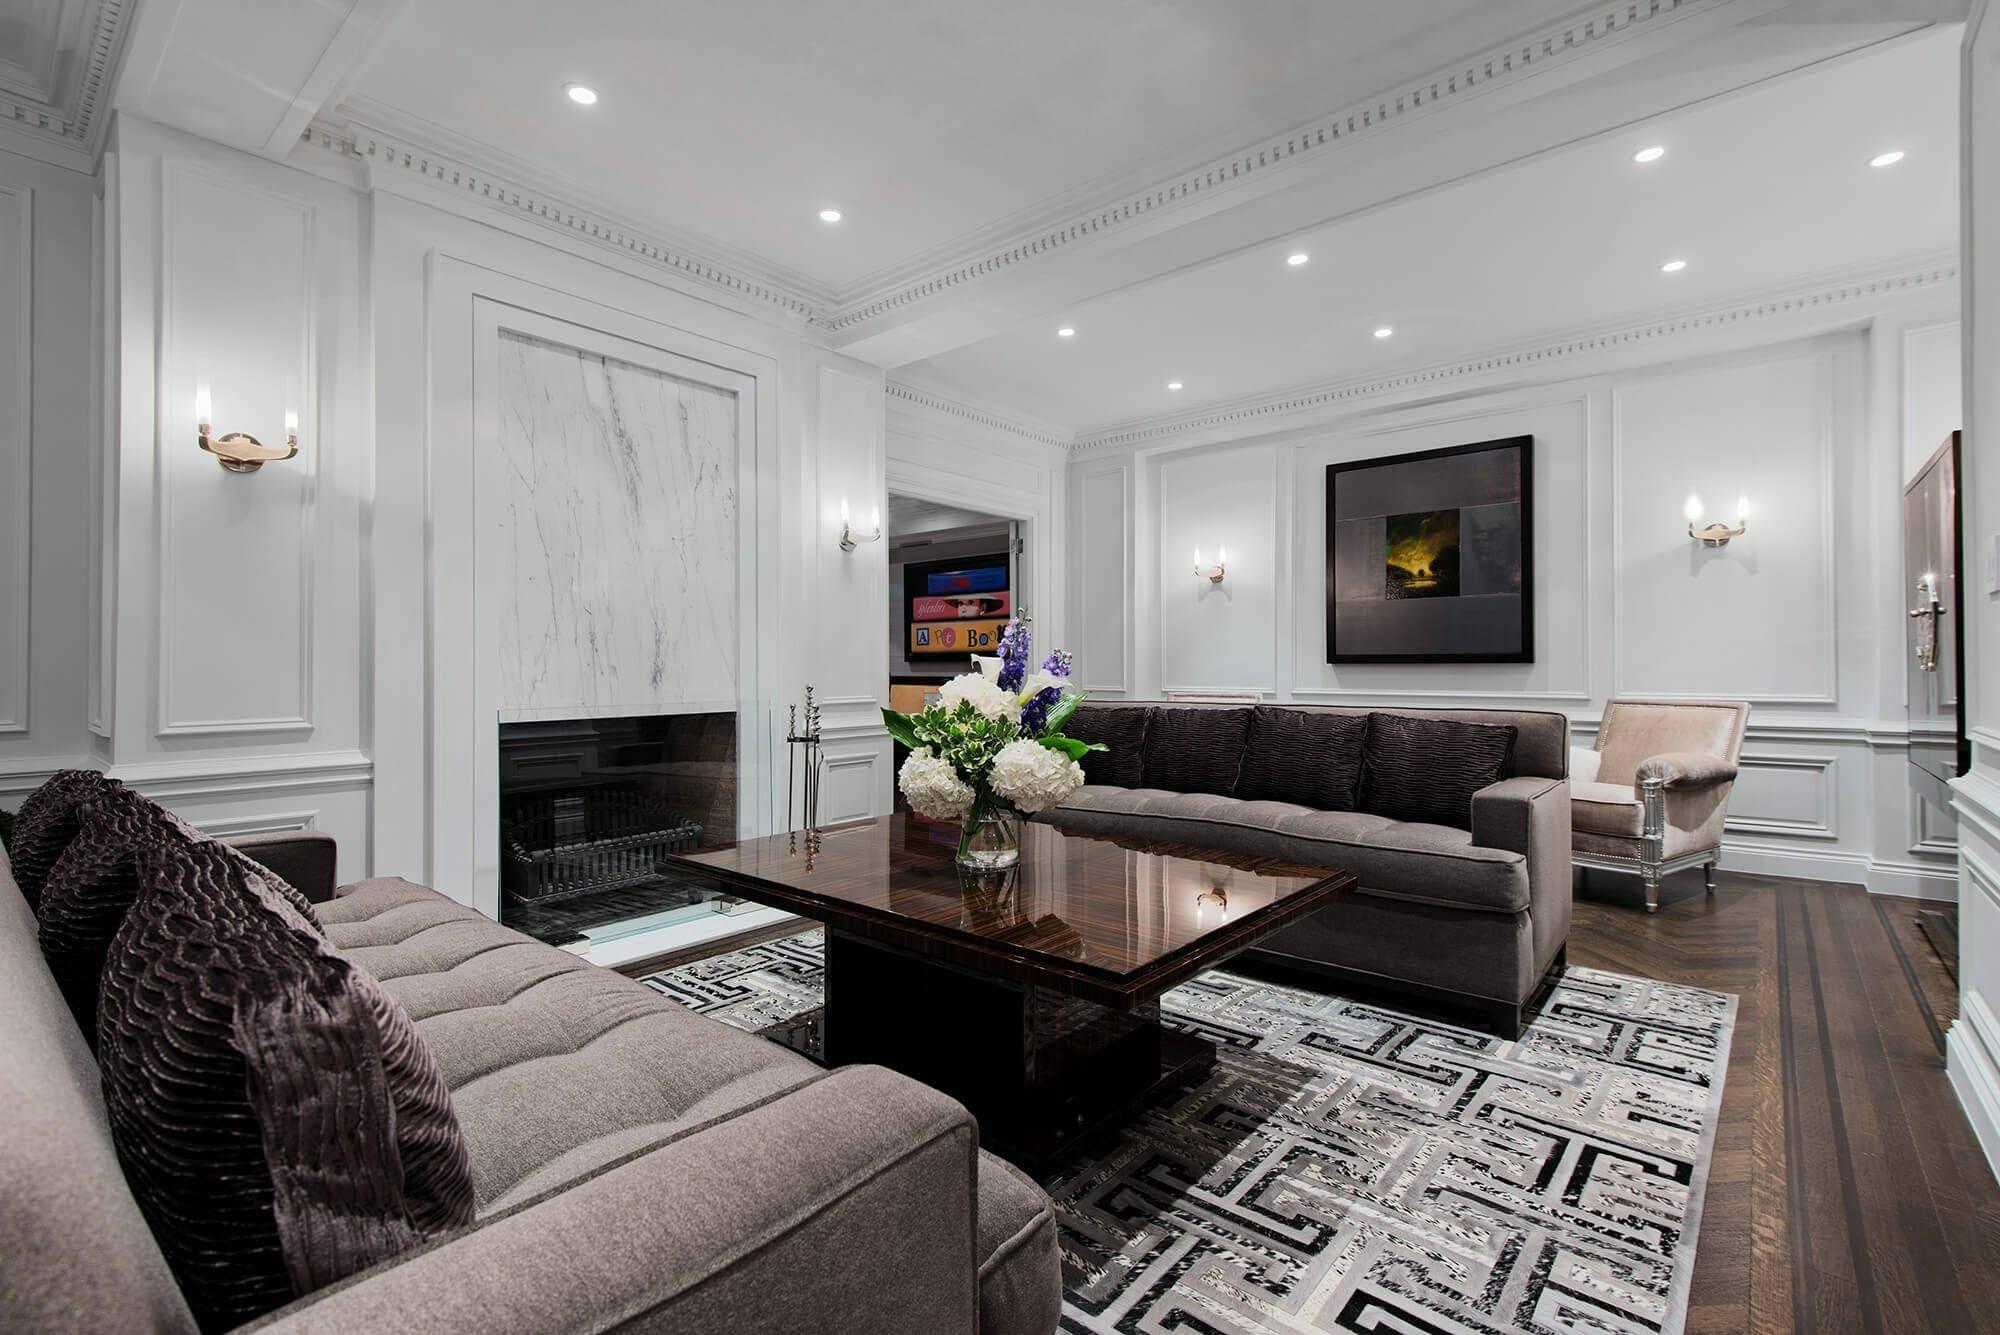 Luxury transitional sitting room by top miami interior designer britto charette